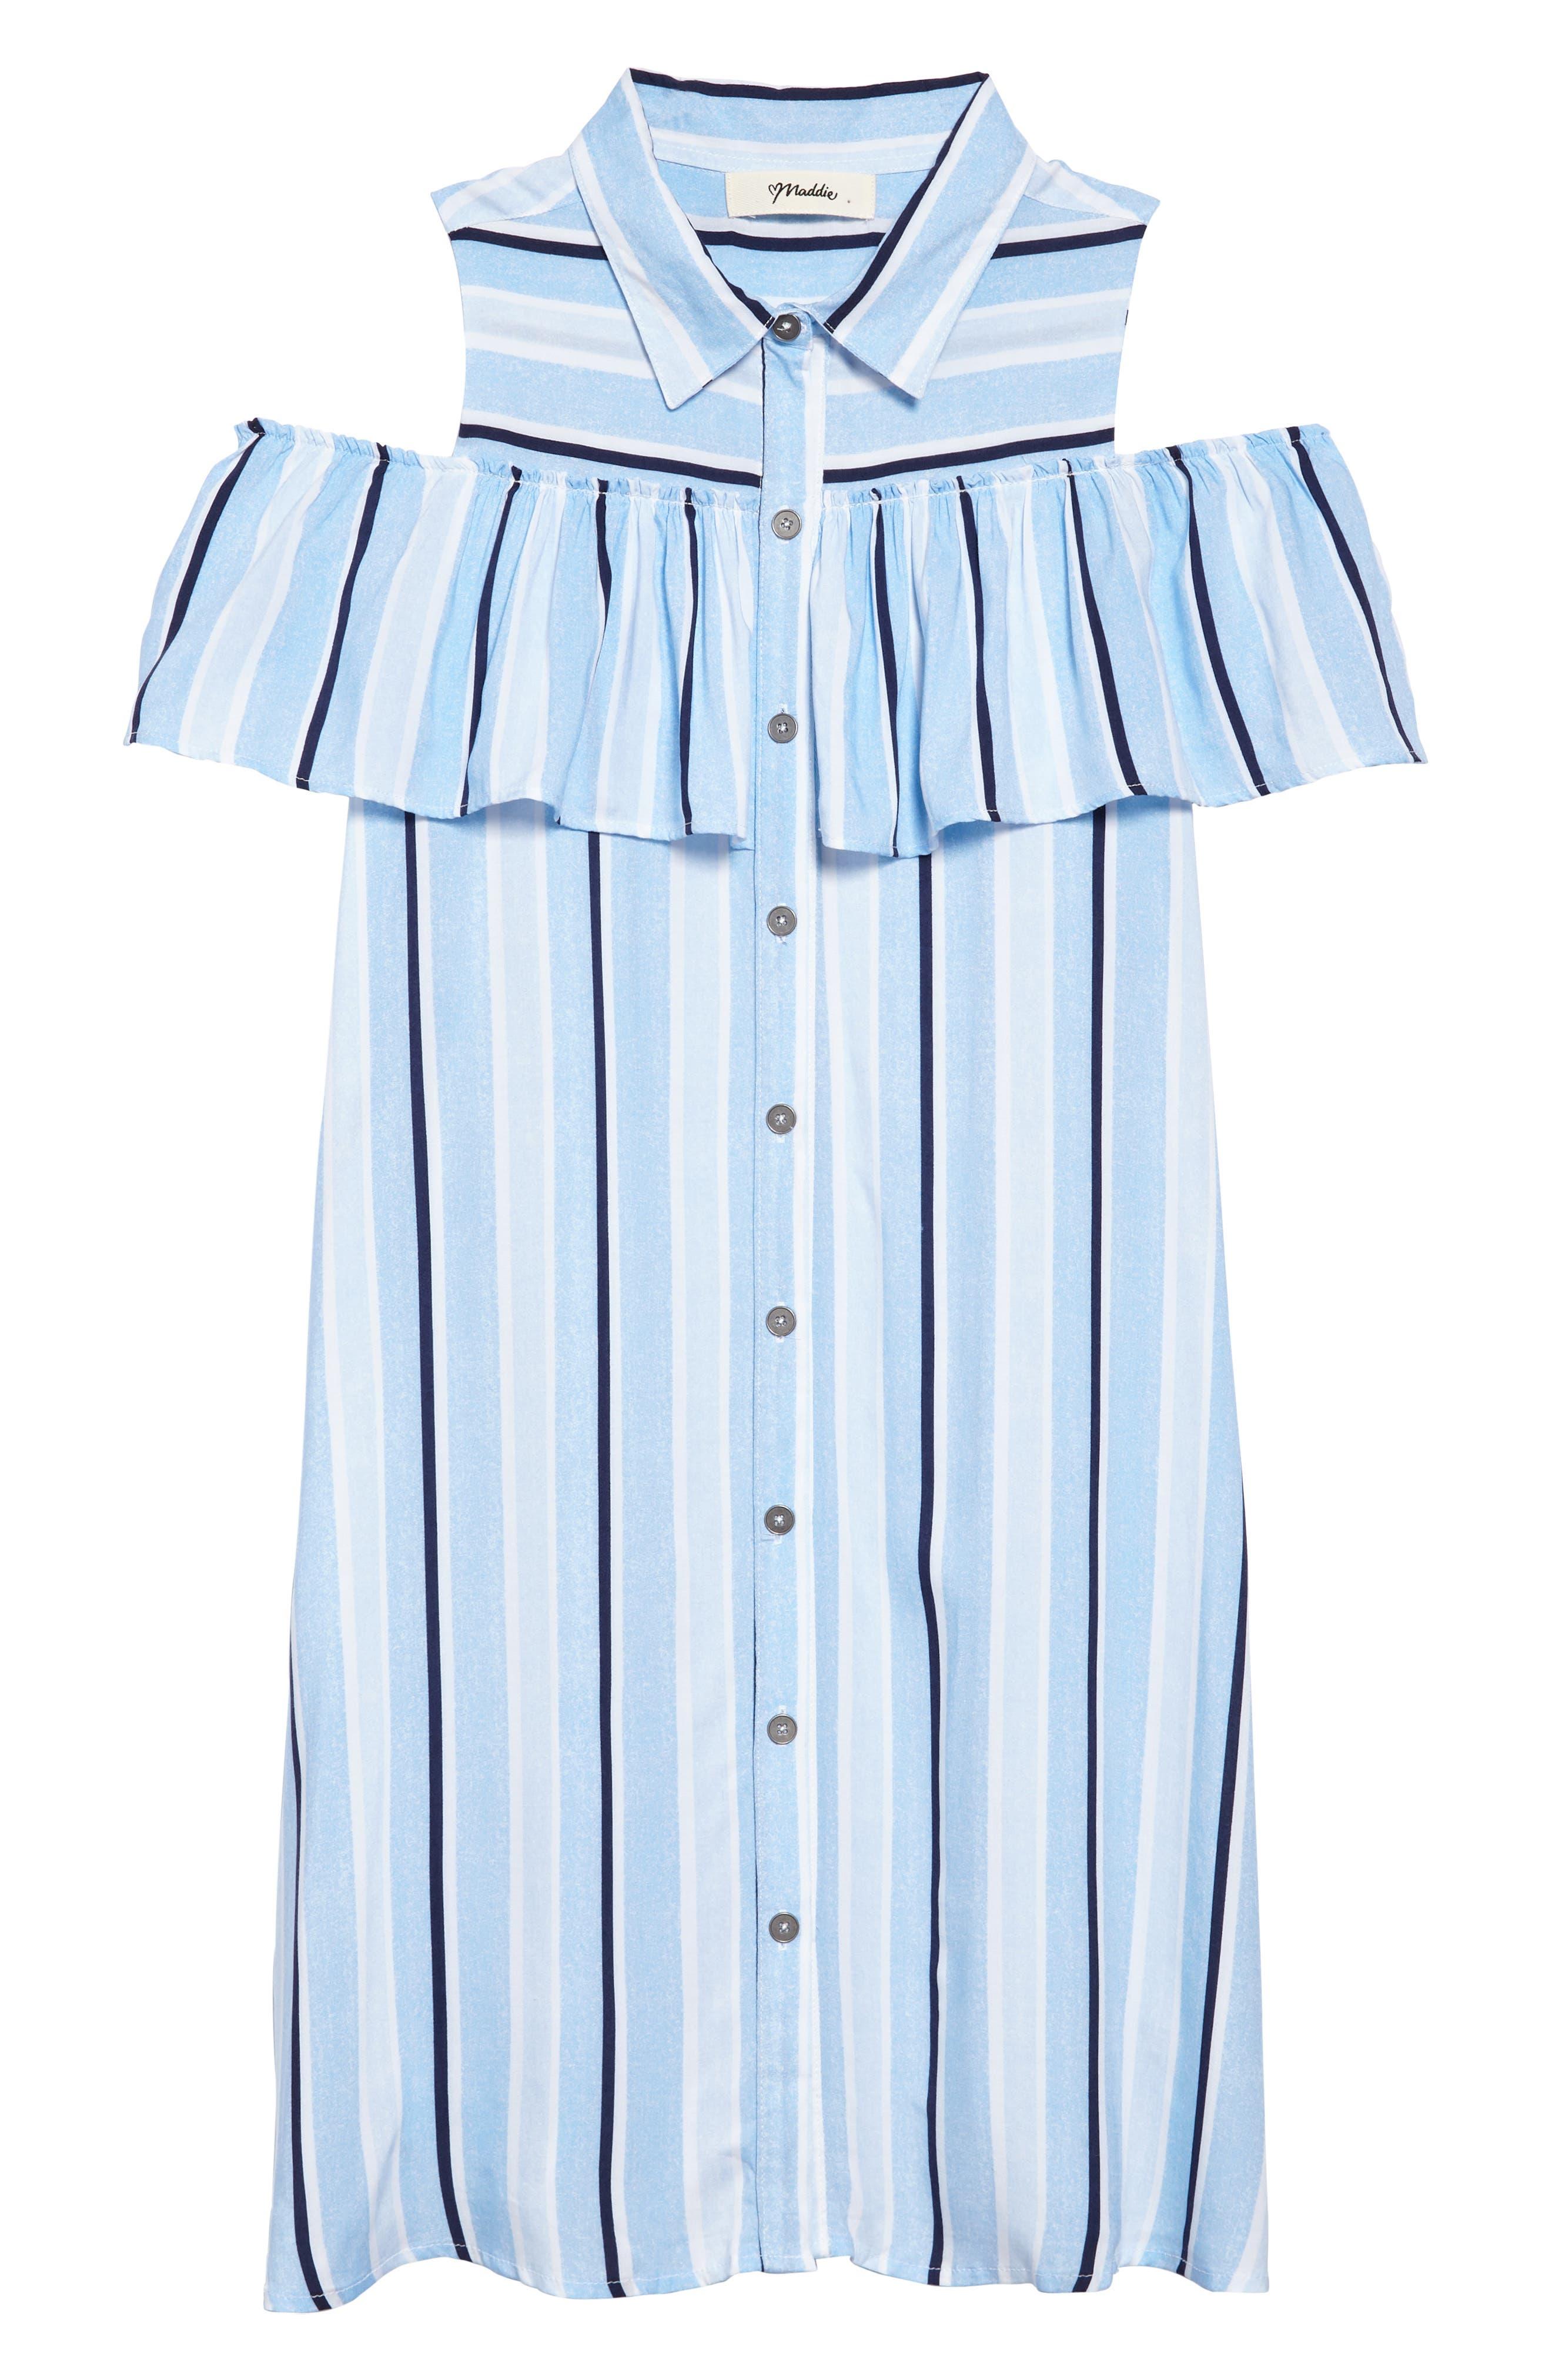 Cold Shoulder Knit Shirtdress,                         Main,                         color, Light Blue/ White